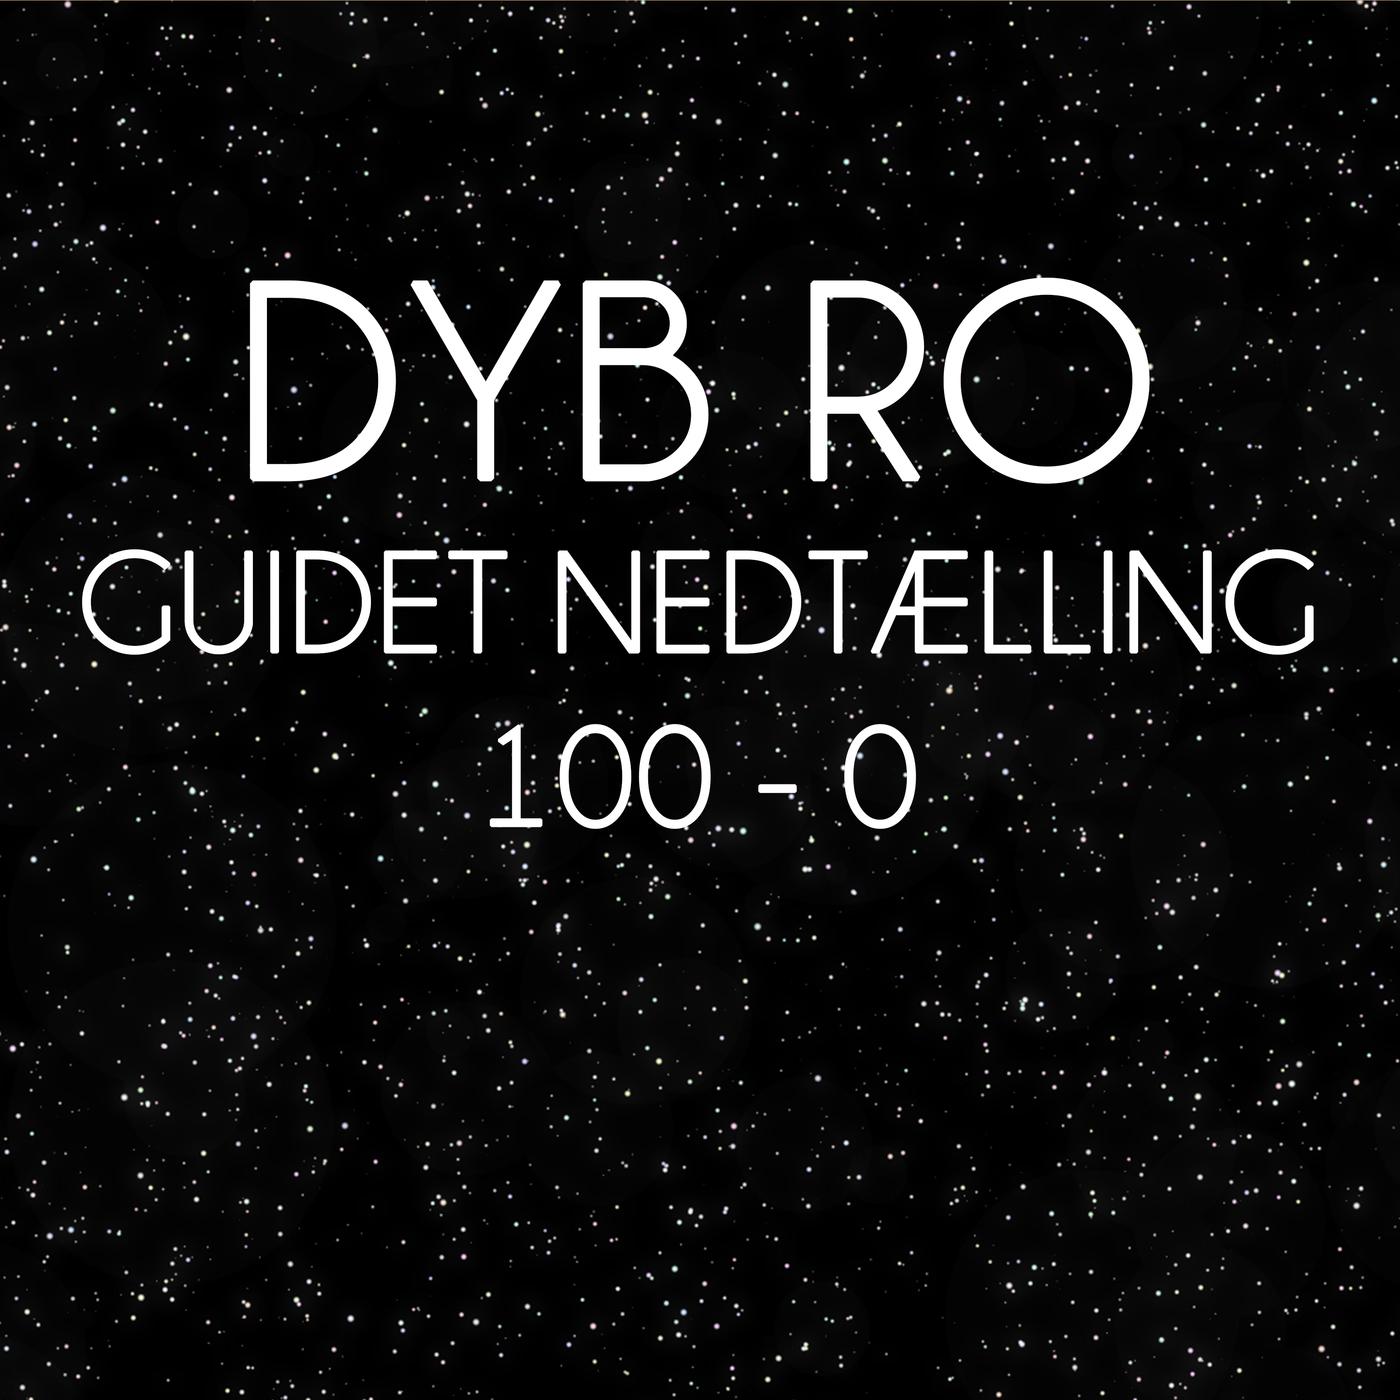 Guidet Nedtælling 100-0 - Dyb Ro